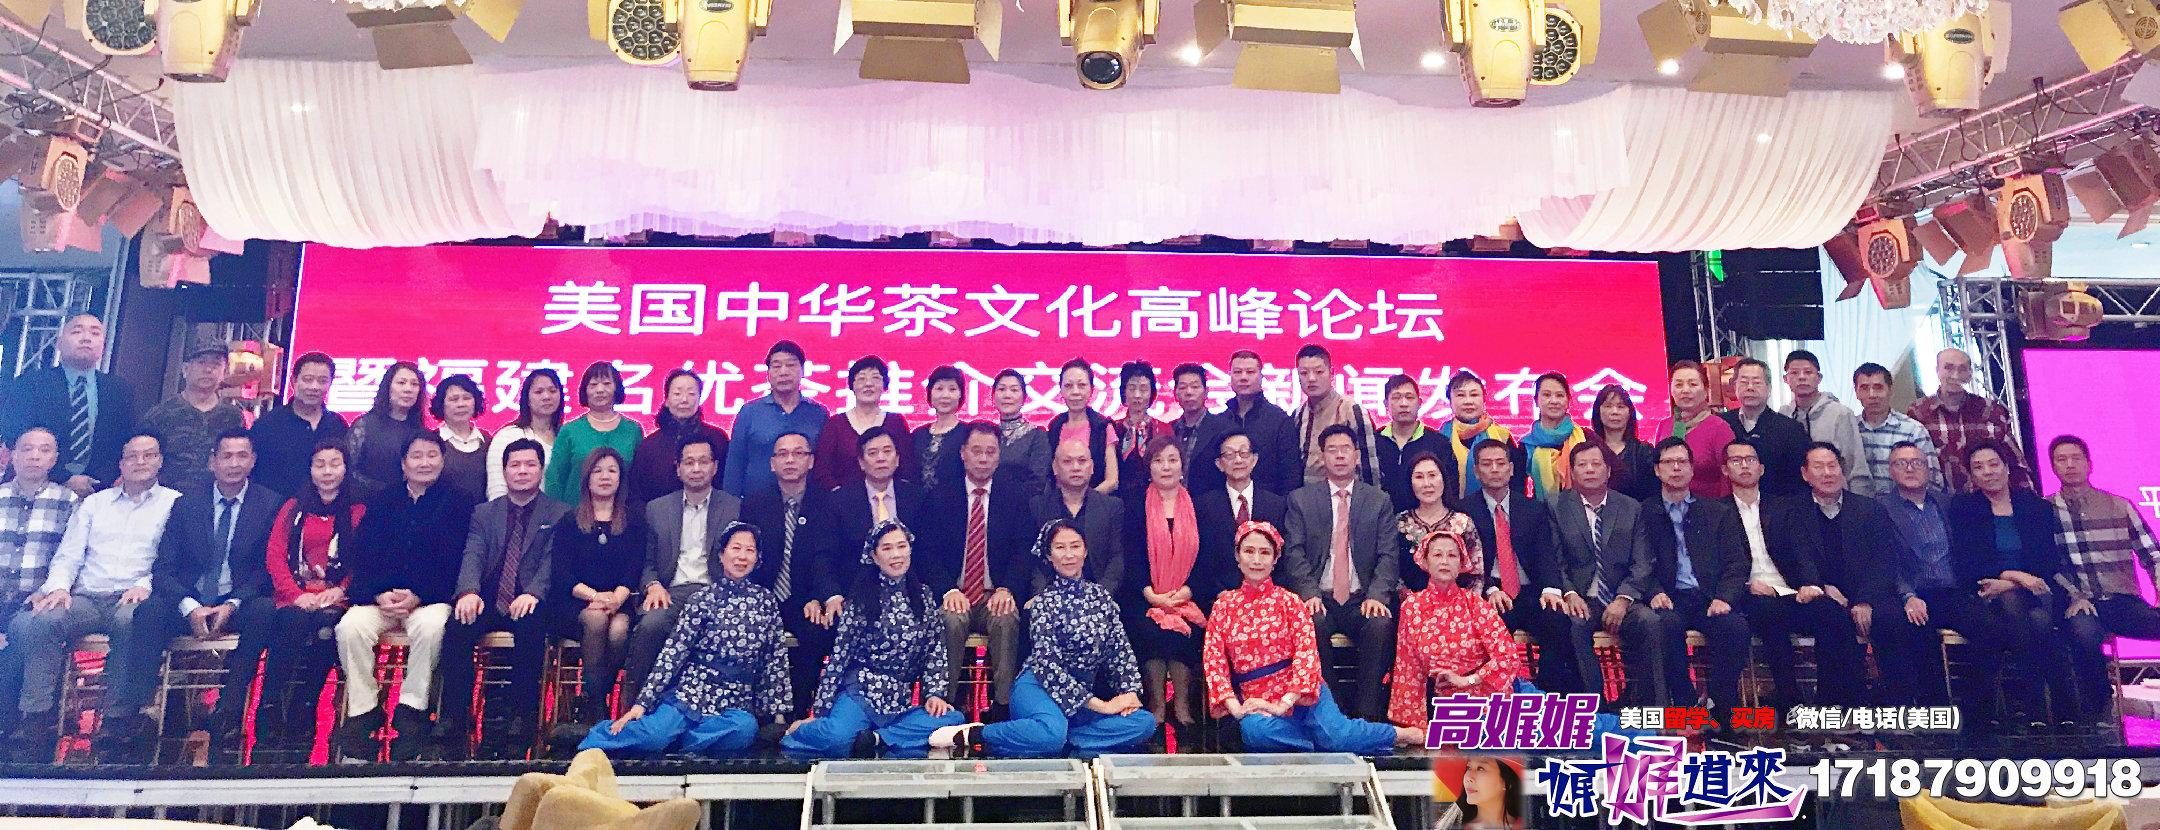 WeChat Image 20181025230756